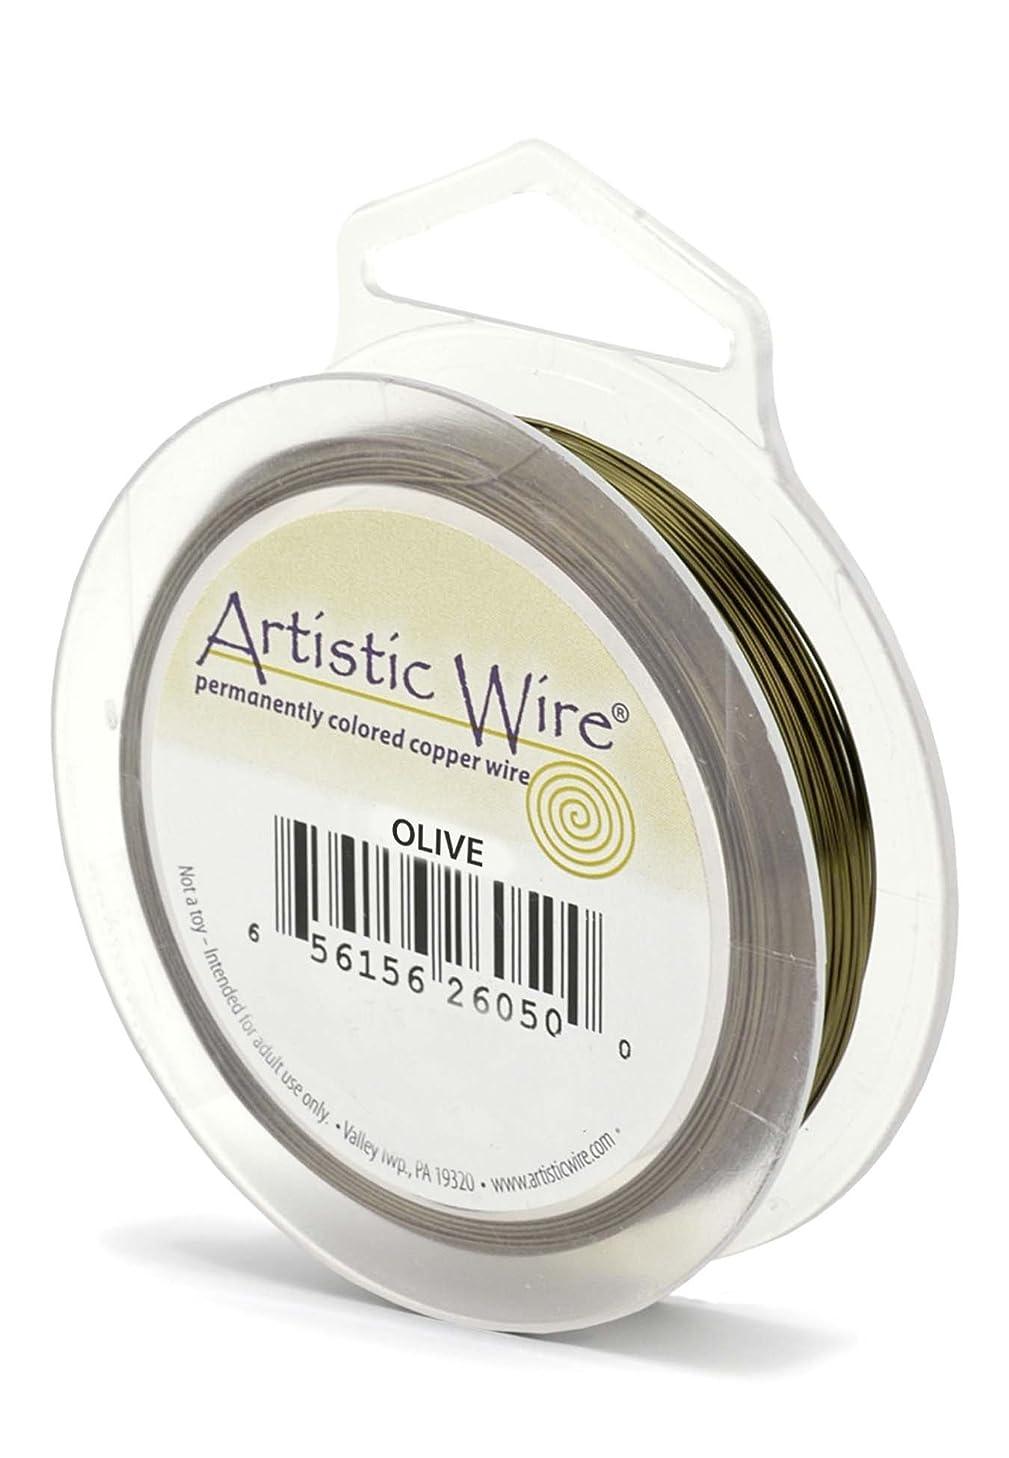 Artistic Wire 18 Gauge Wire, Olive, 10-Yard